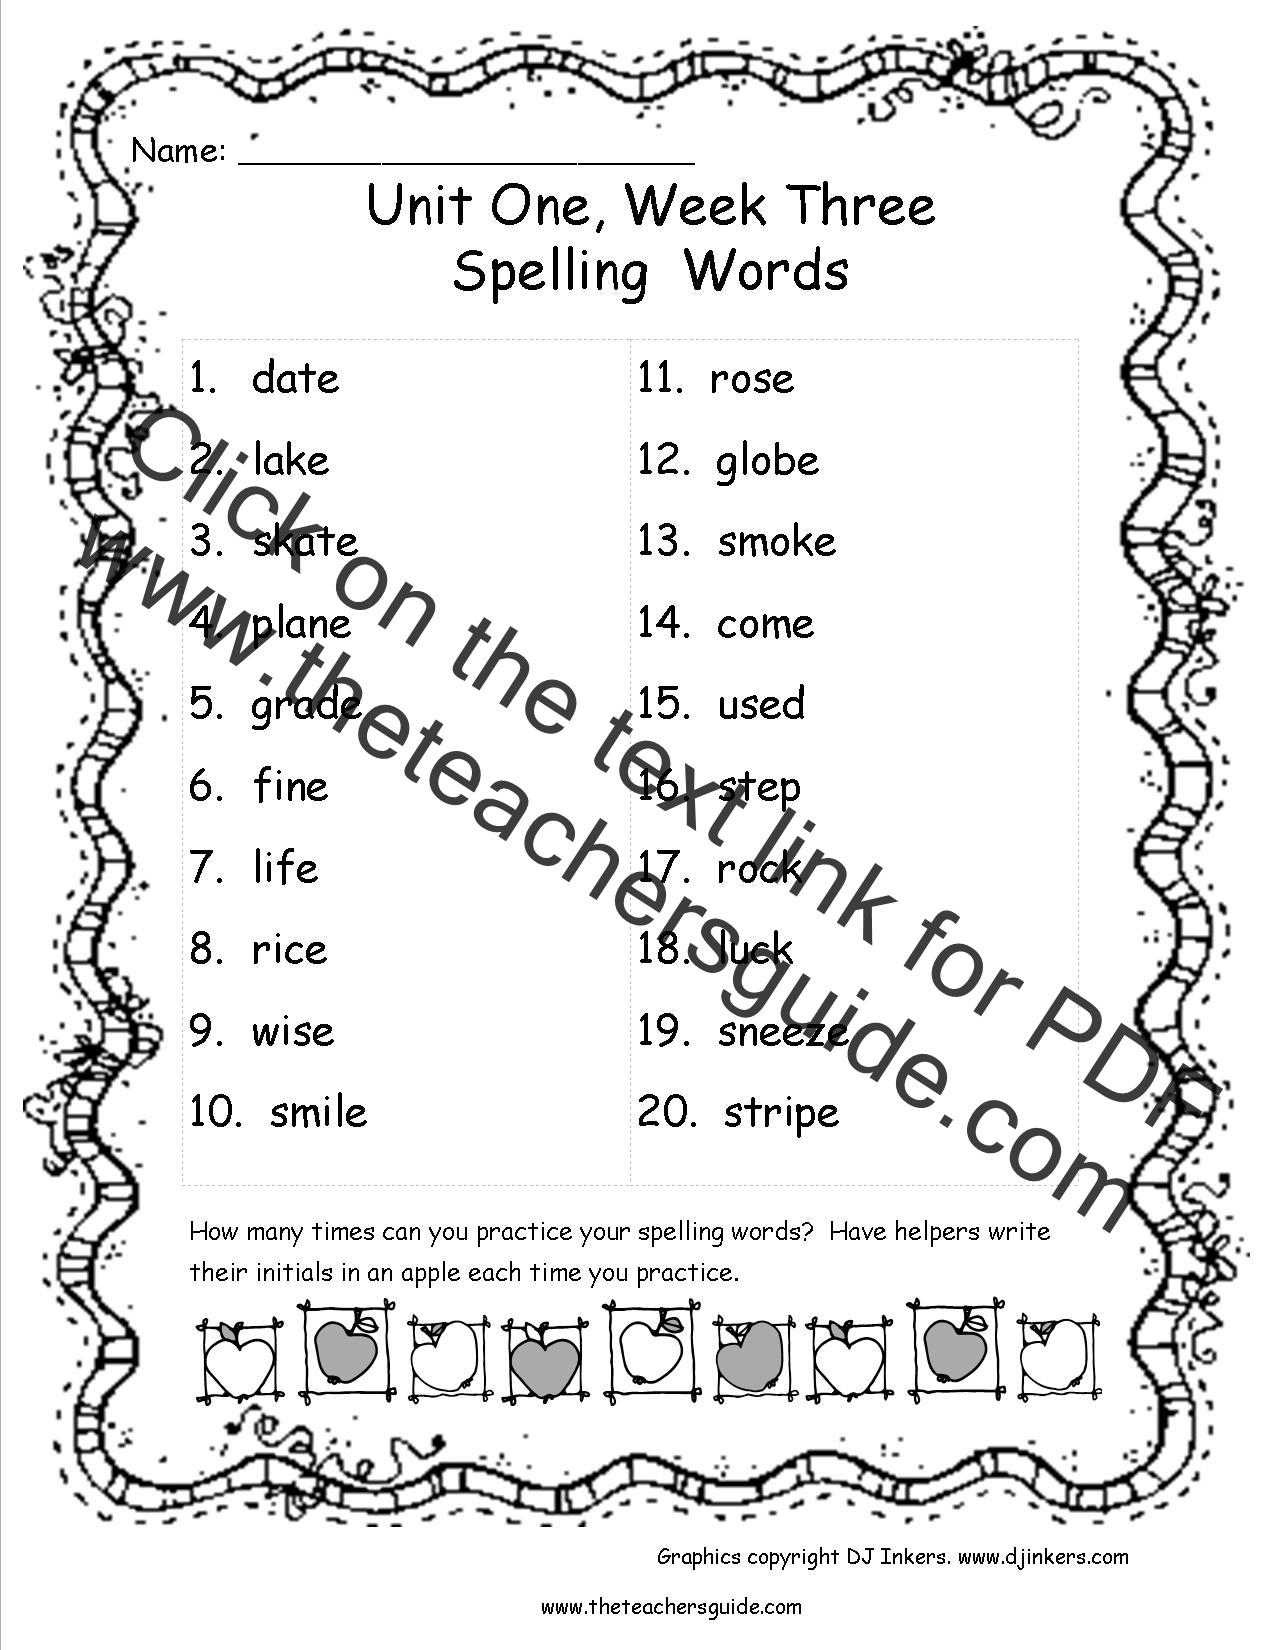 Worksheet Word List For Third Grade wonders third grade unit one week three printouts mcgraw hill spelling words list